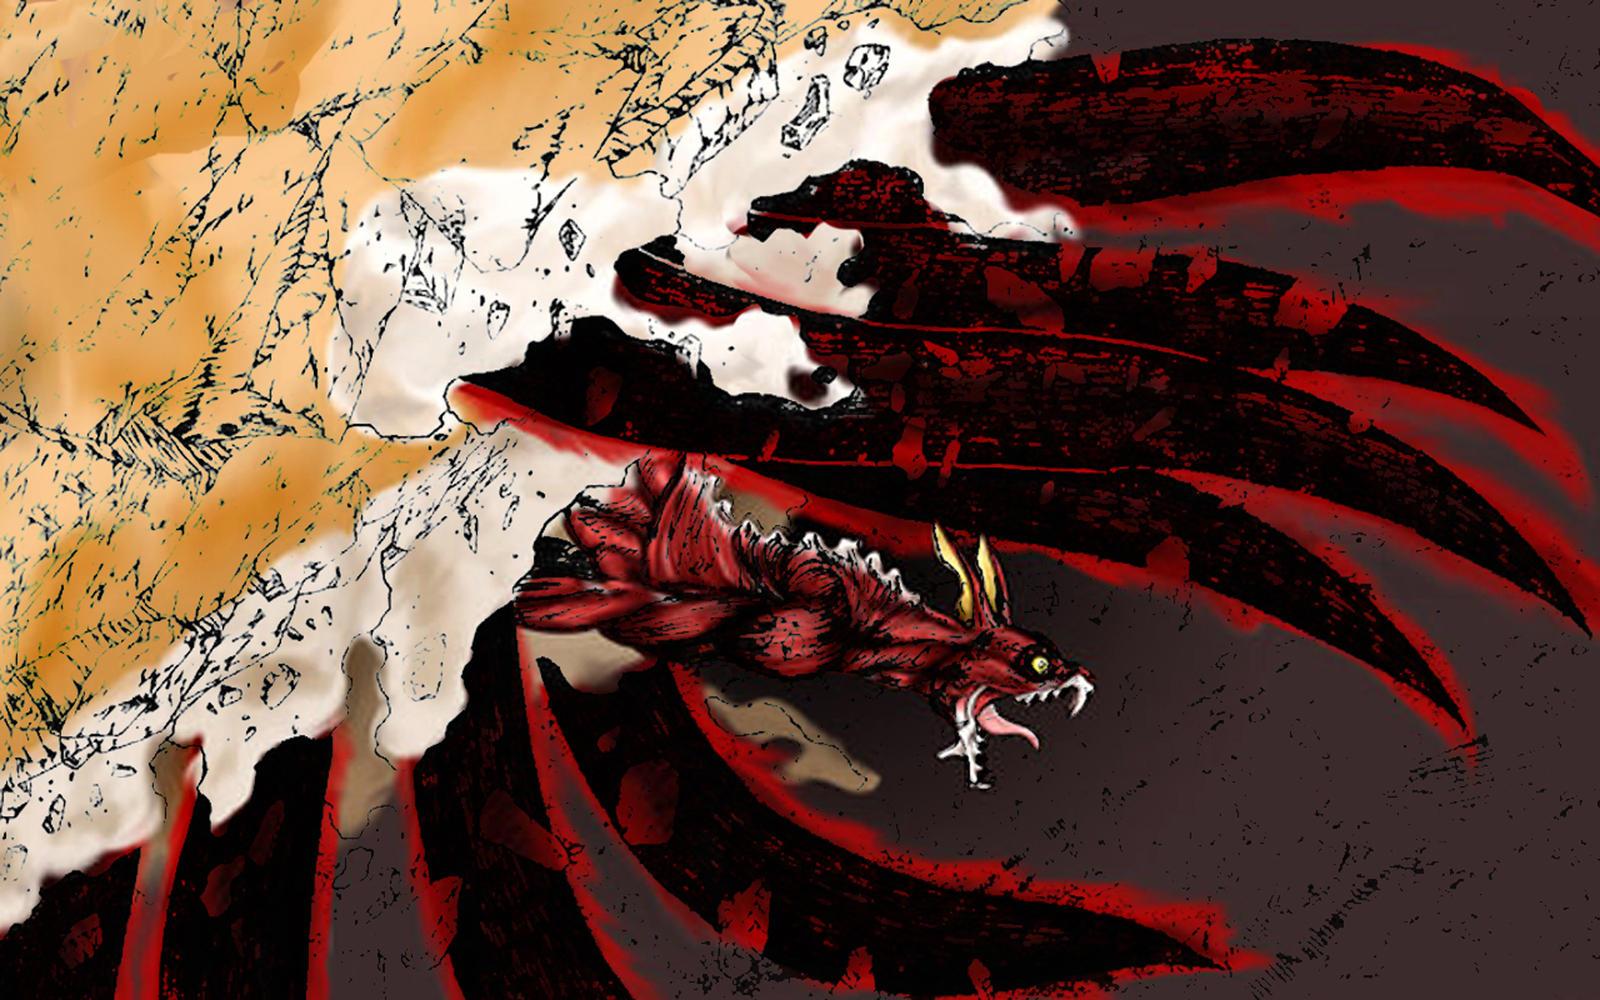 Naruto 8 tails by Heidelmeier17 on DeviantArt